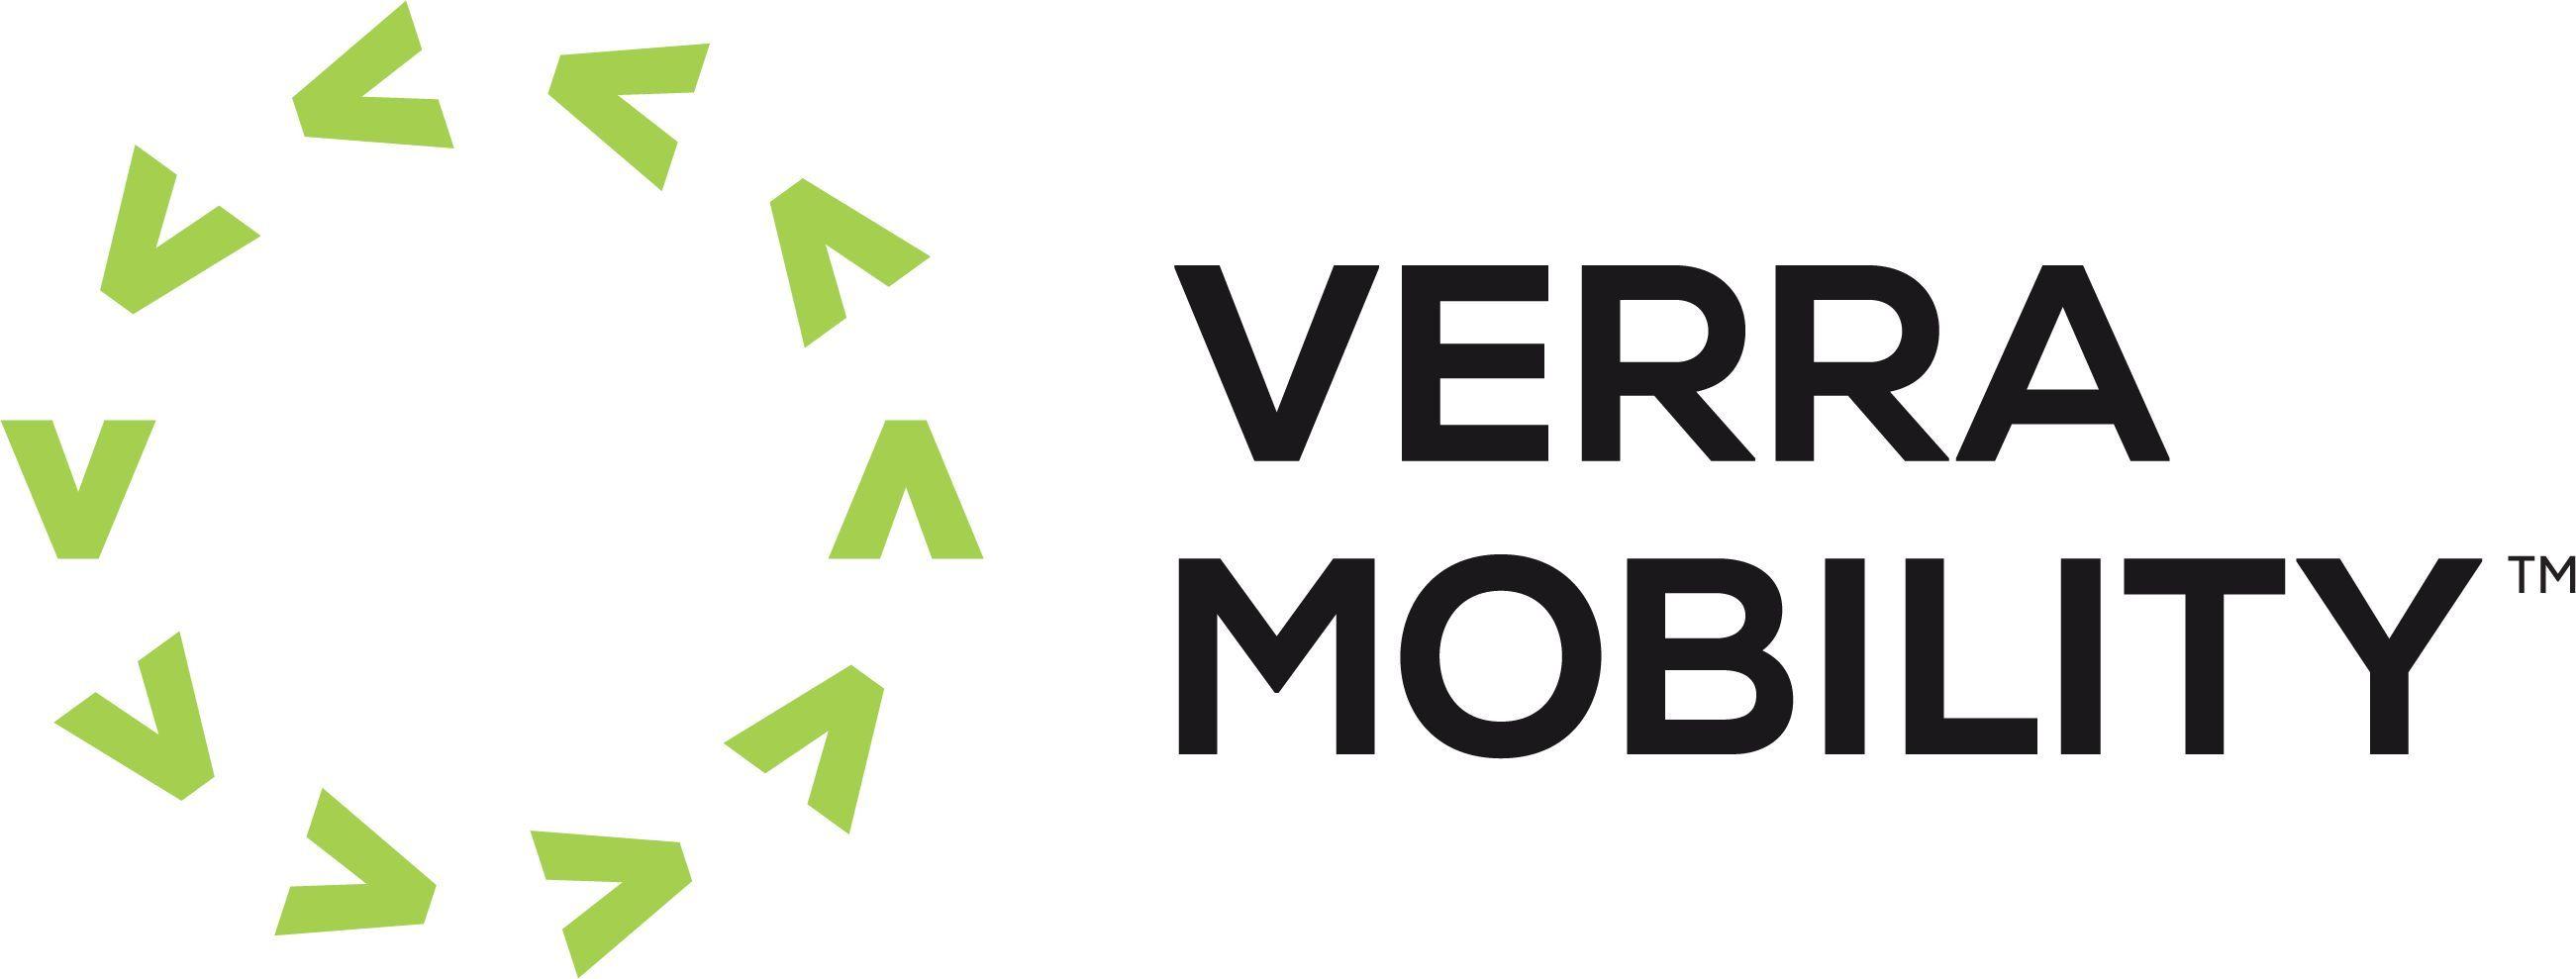 Verra Mobility_2018